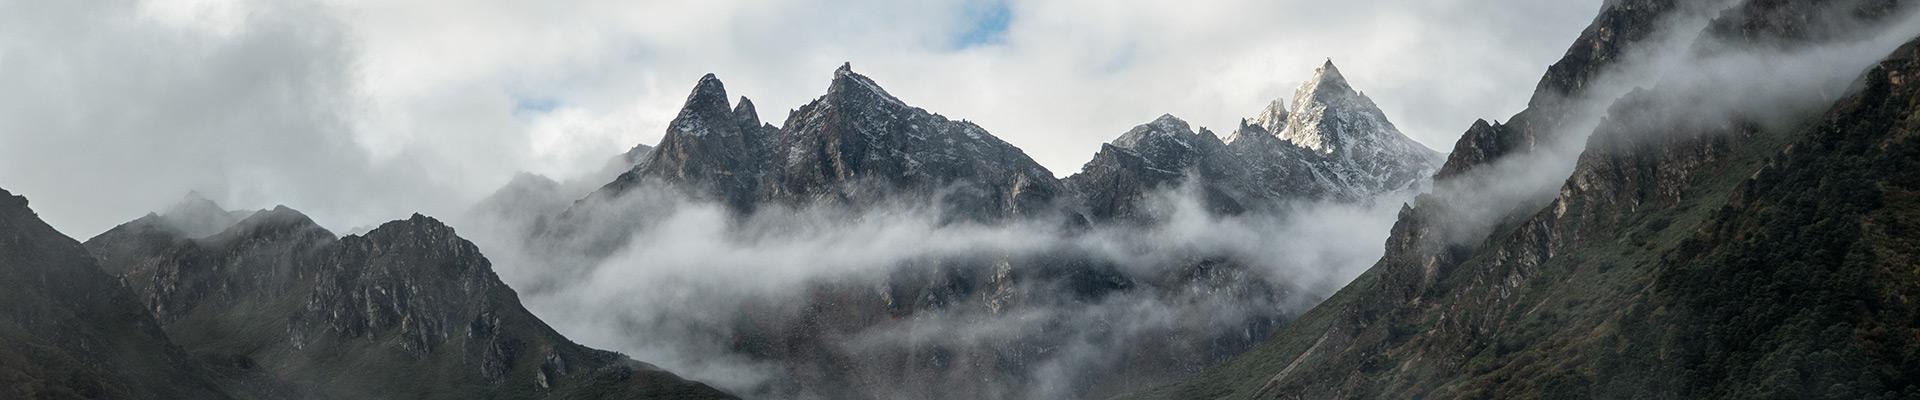 Top image montagnes depuis Laya, Bhoutan